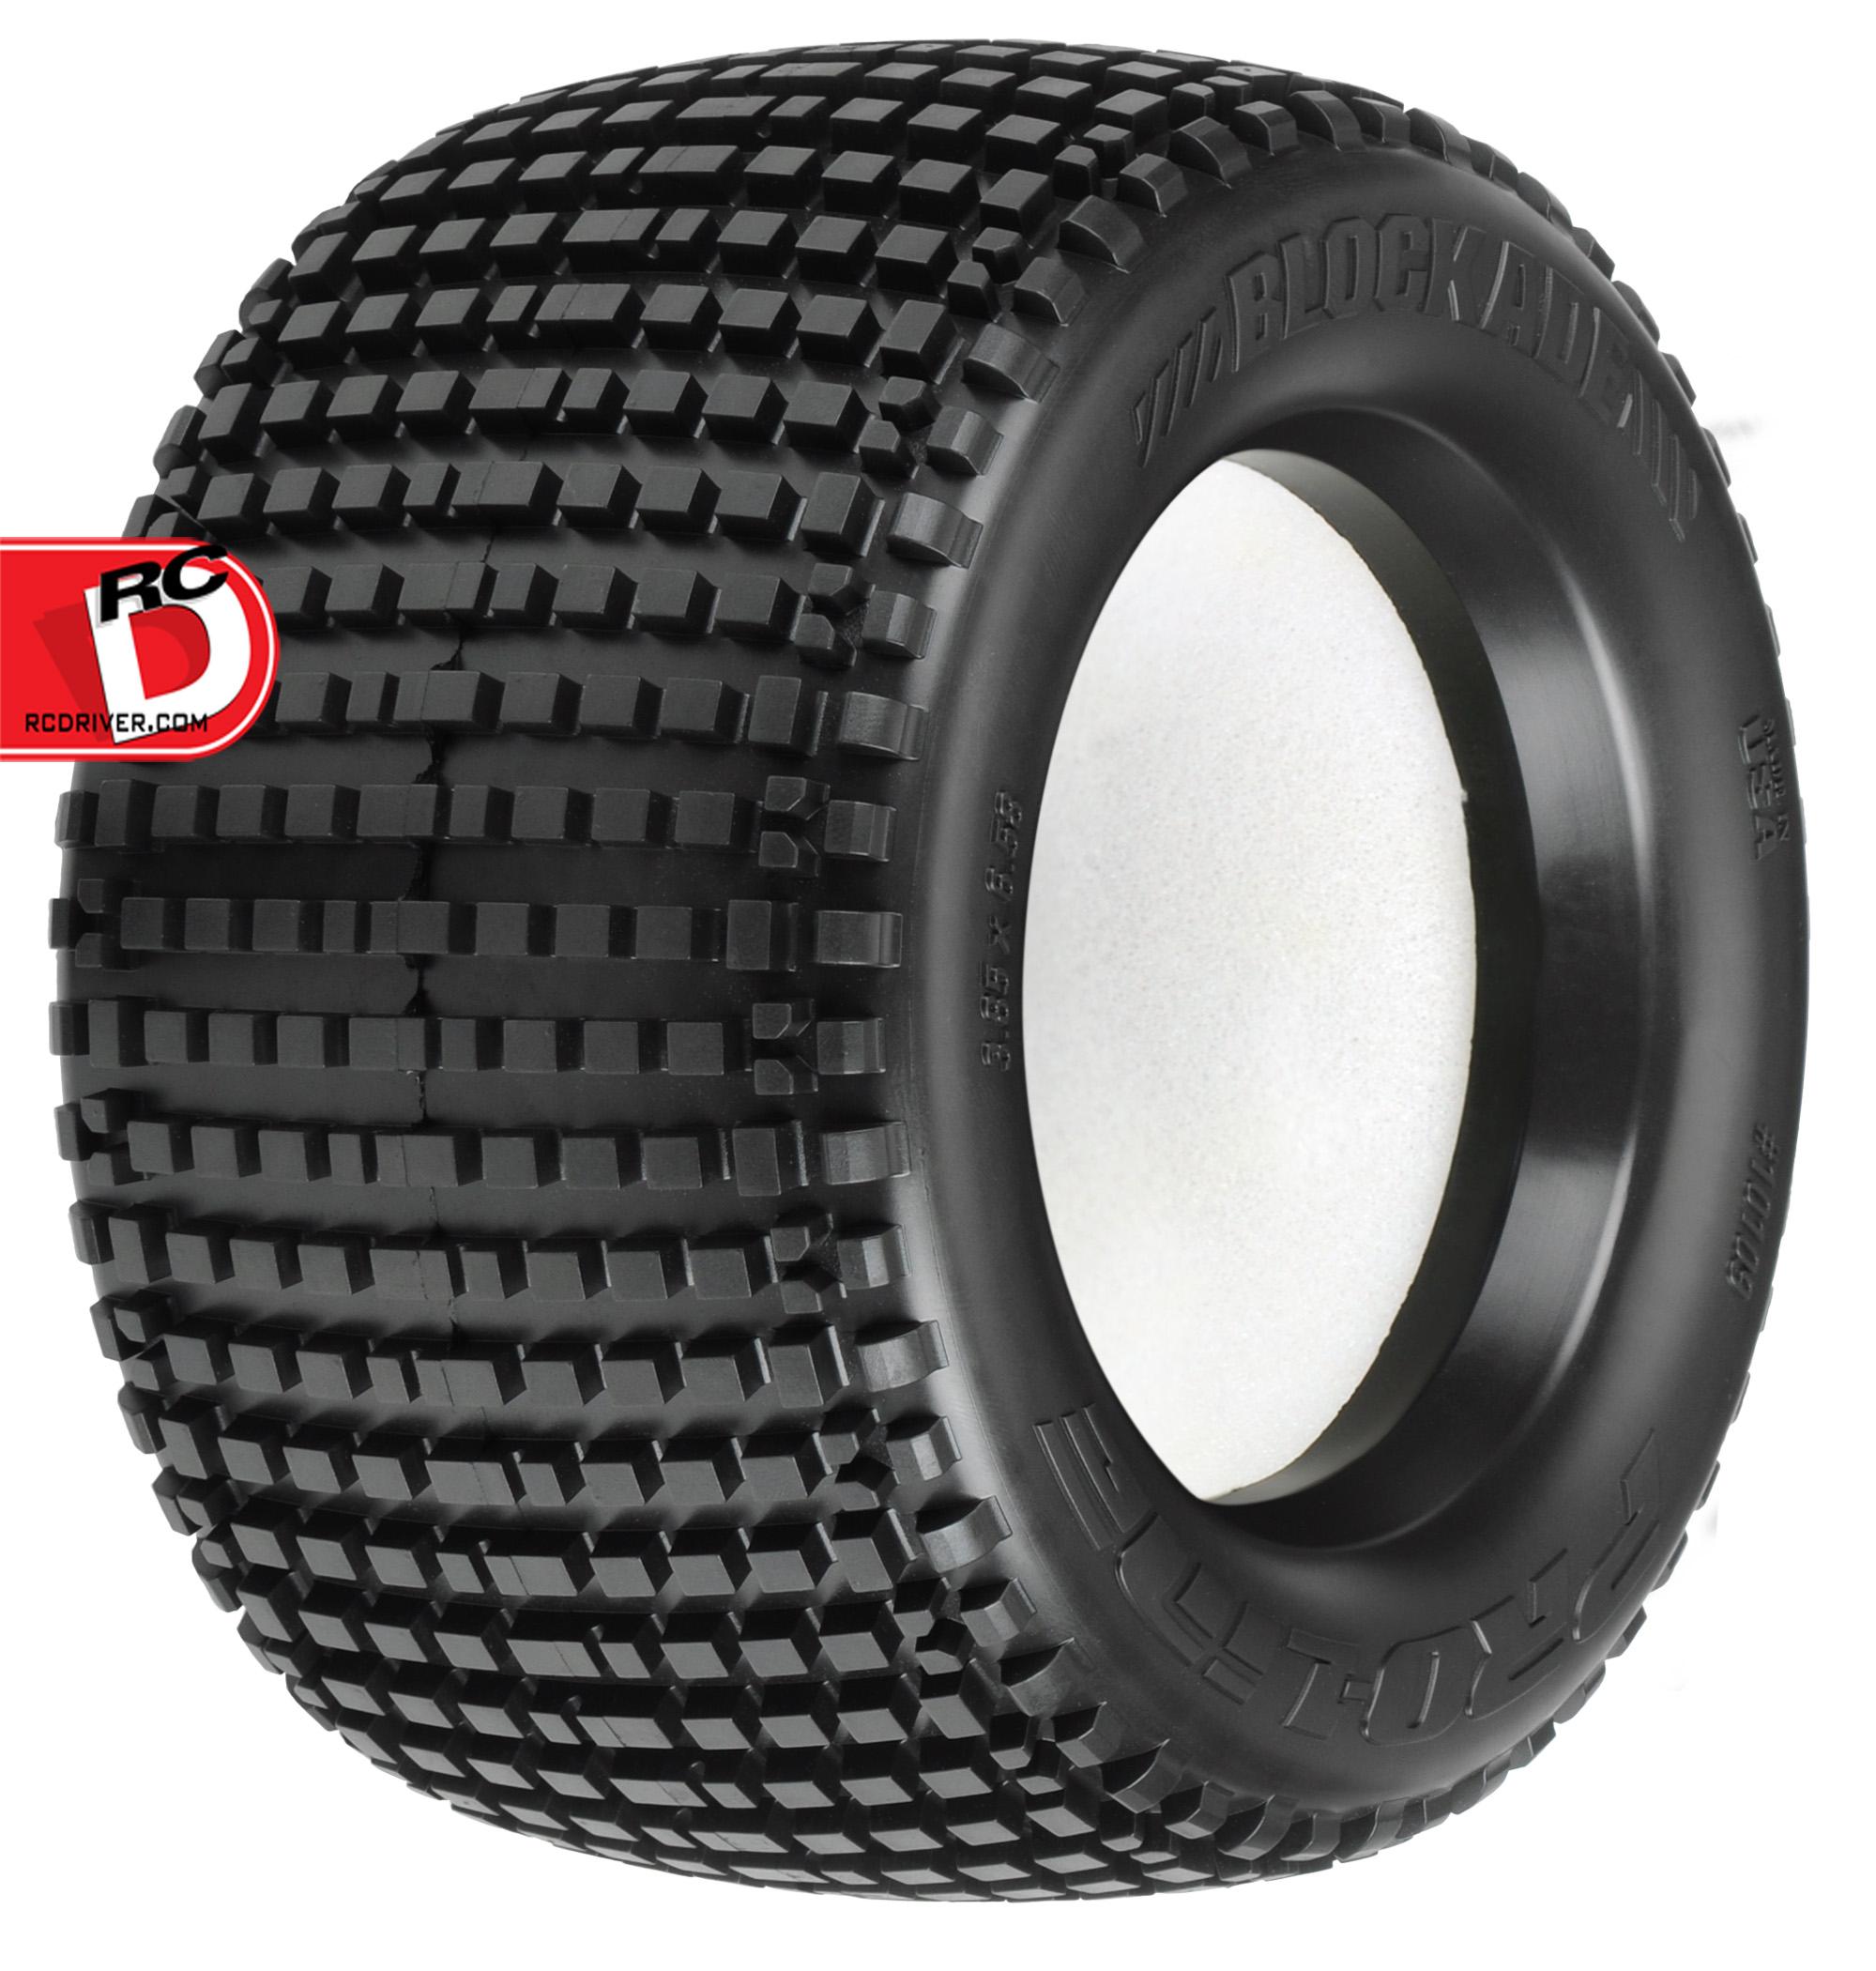 Pro-Line Blockade 3.8″ (Traxxas Style Bead) All Terrain Tires